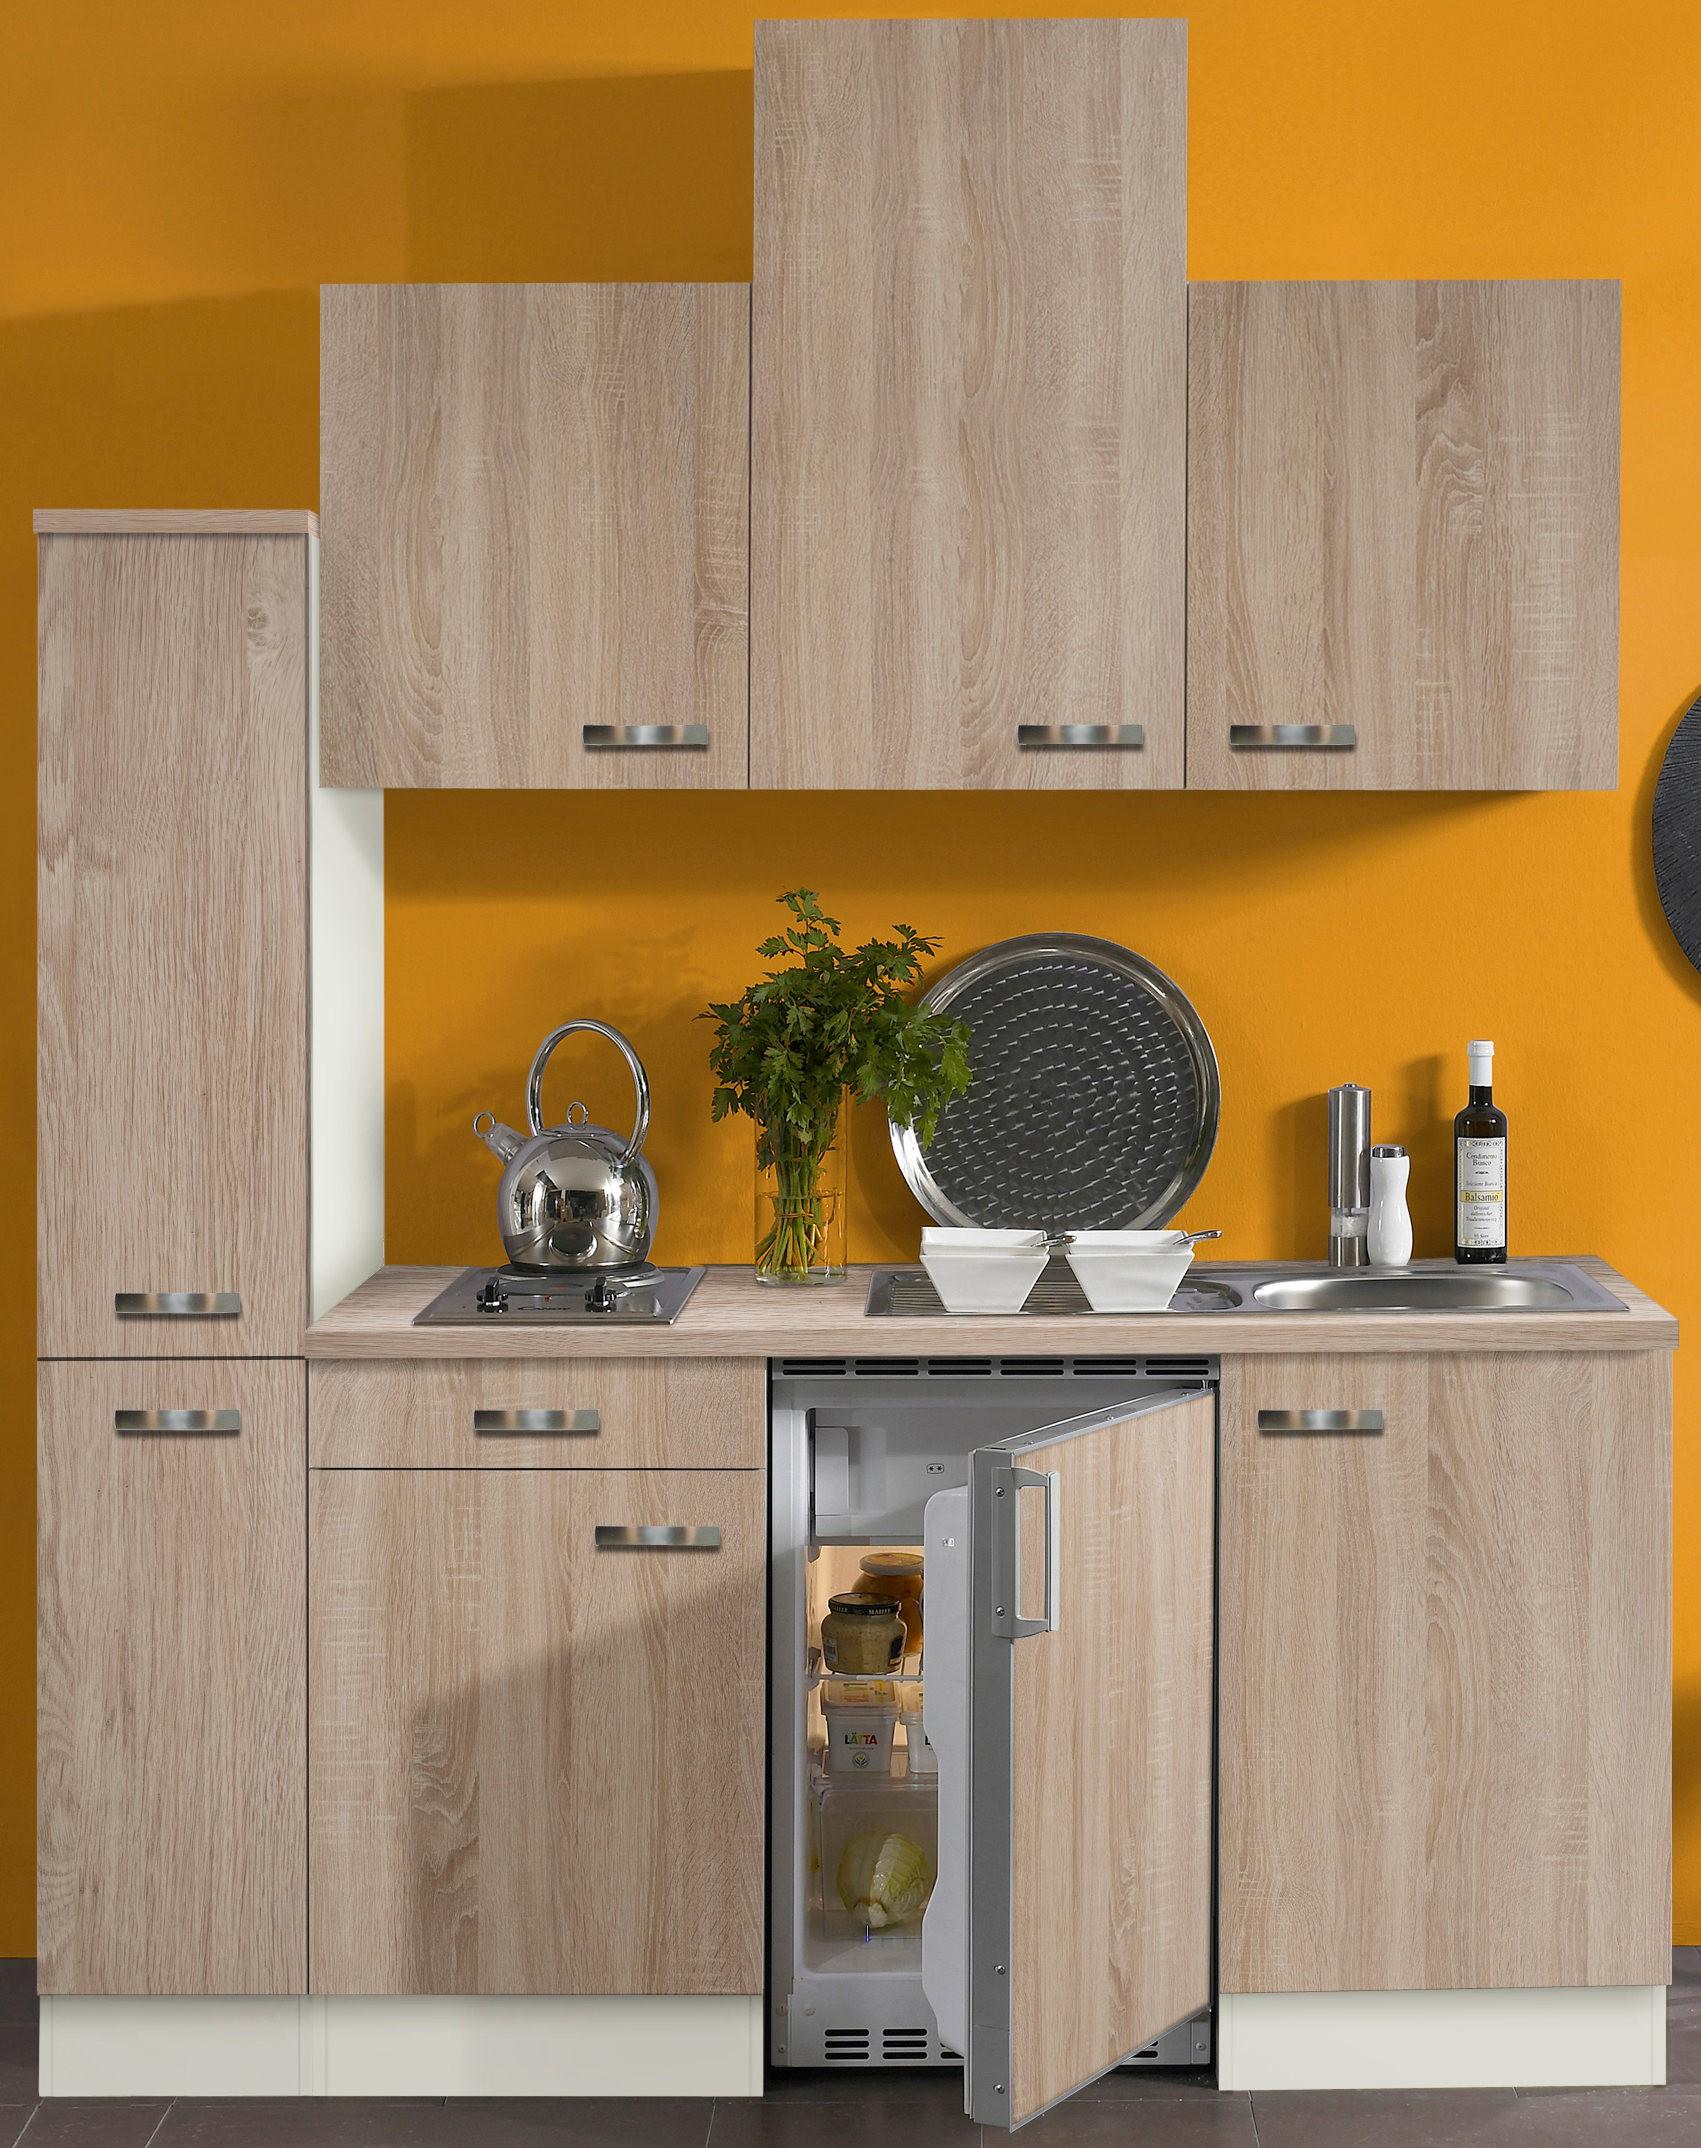 singlek che toledo vario 2 mit elektro kochfeld breite 180 cm eiche k che singlek chen. Black Bedroom Furniture Sets. Home Design Ideas